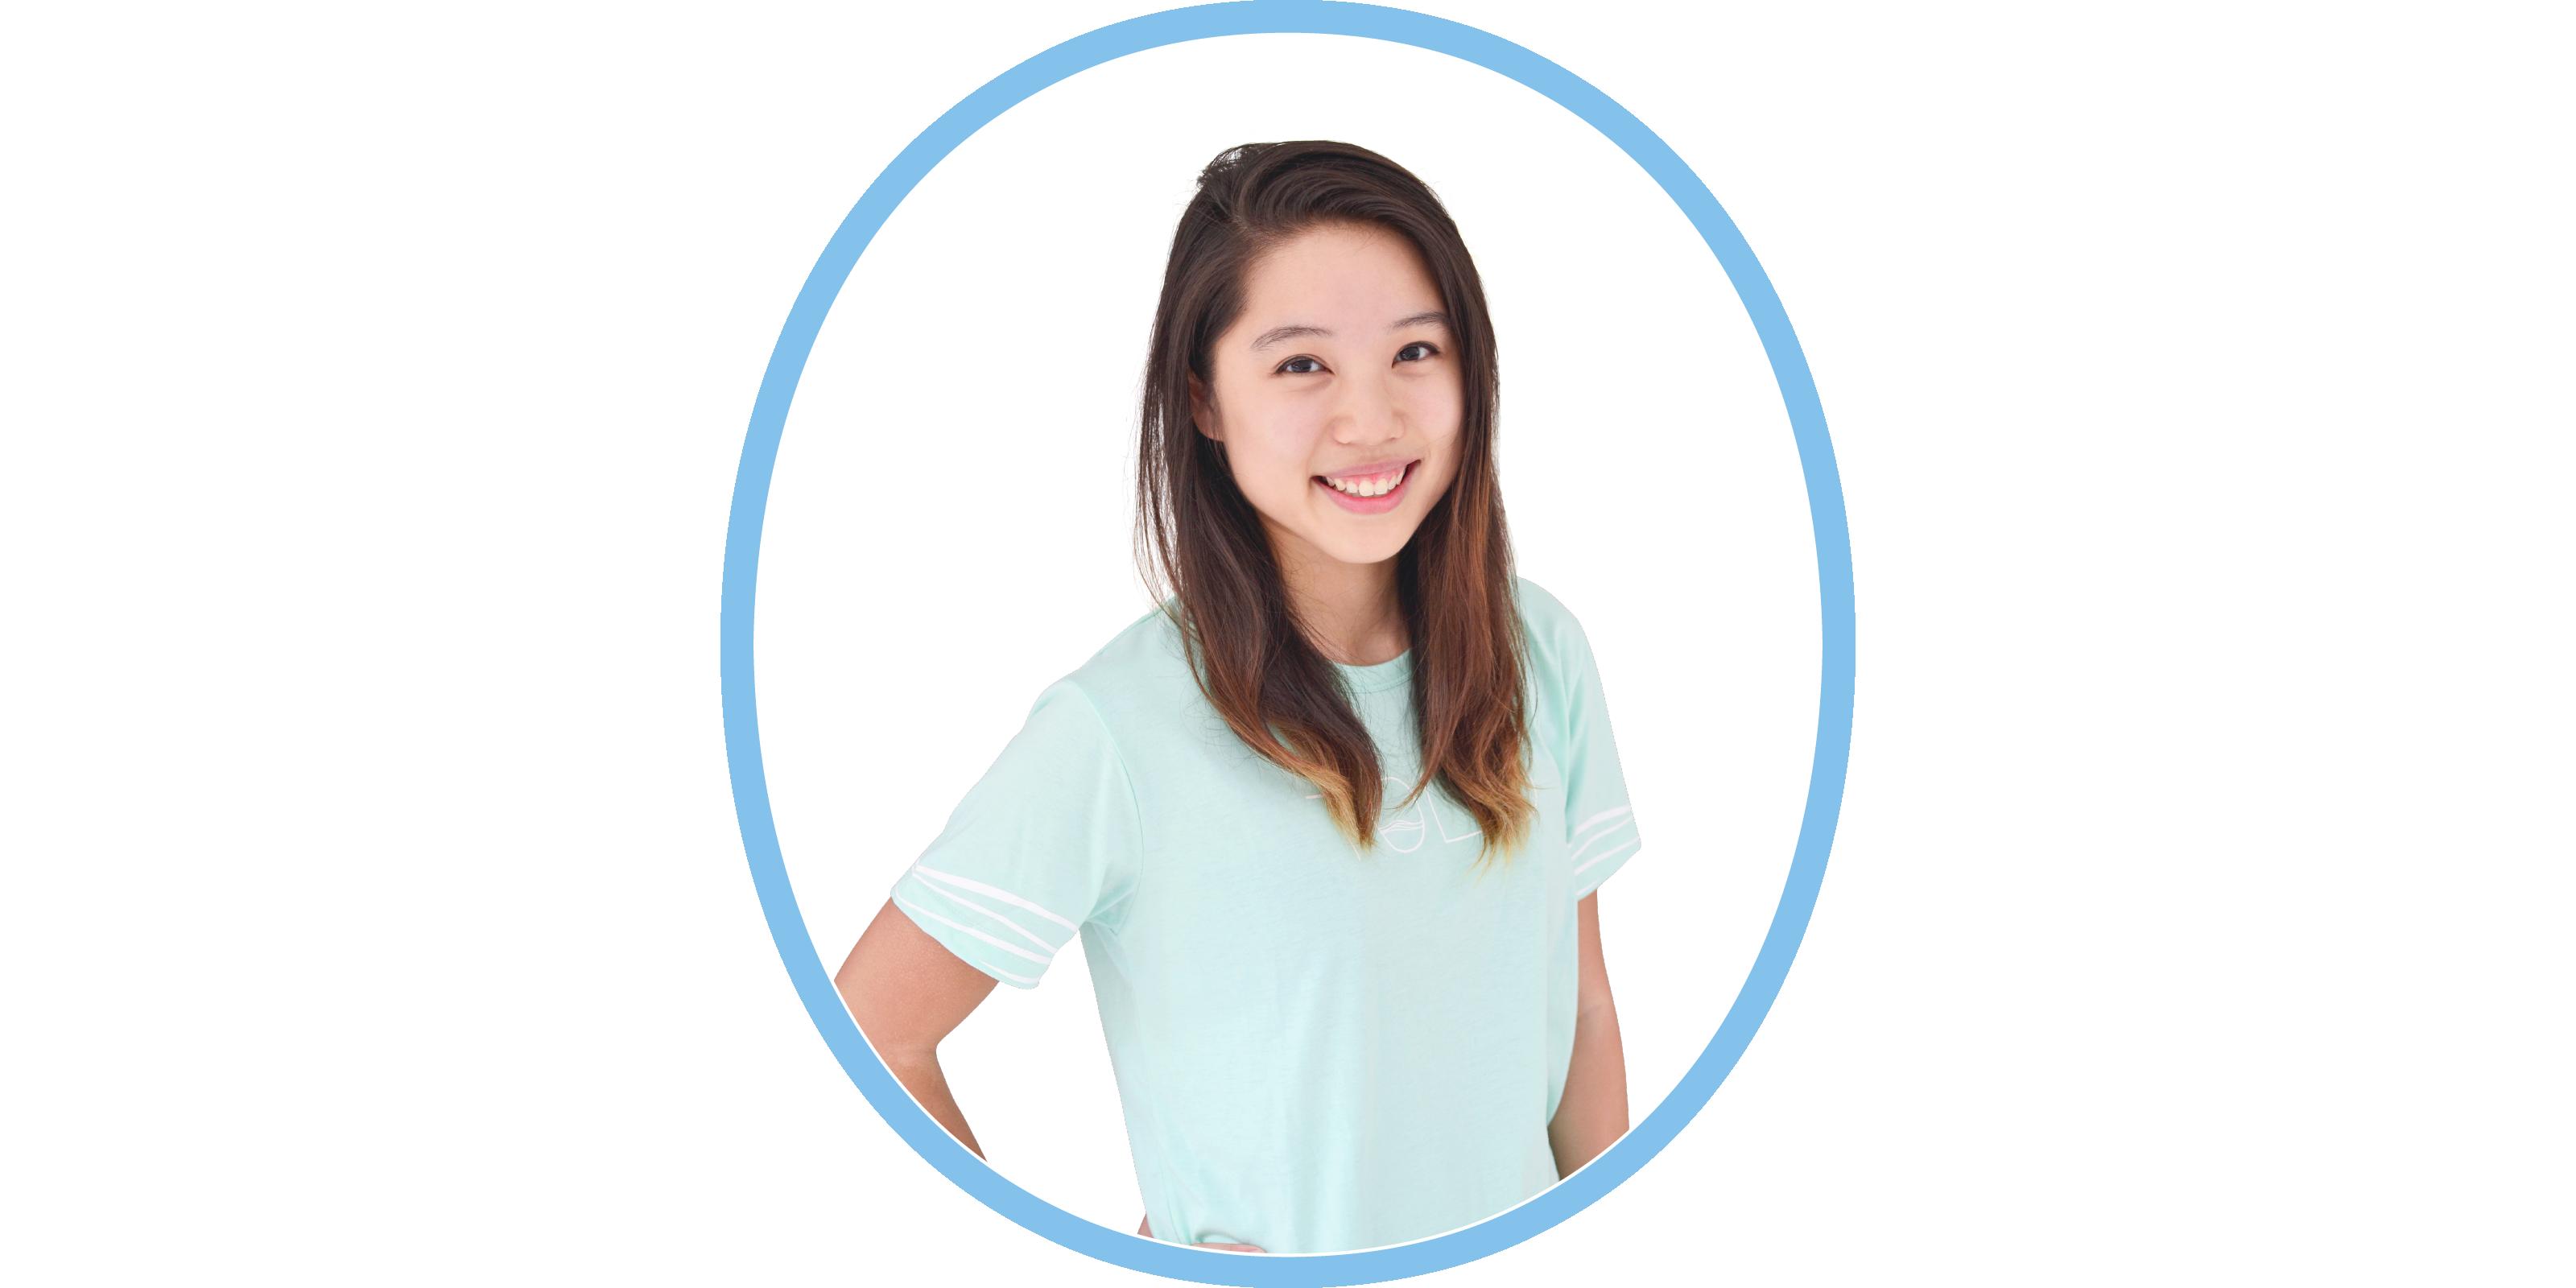 Profile Pic_Thumbnail_768 x 384_2016-2017-Donna